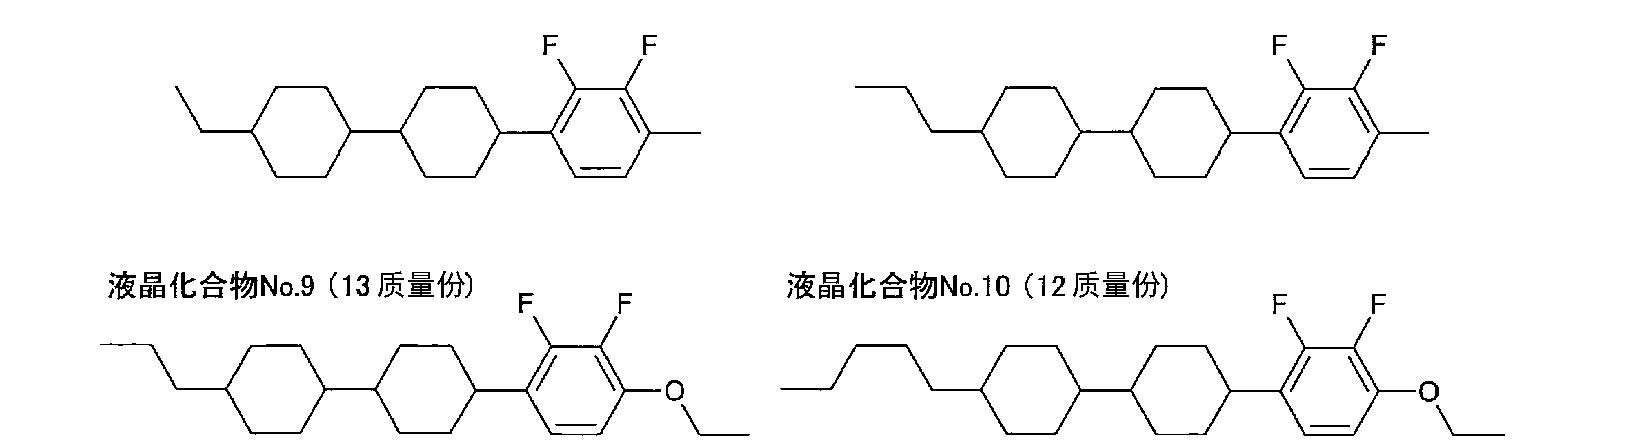 Figure CN102575167AD00314